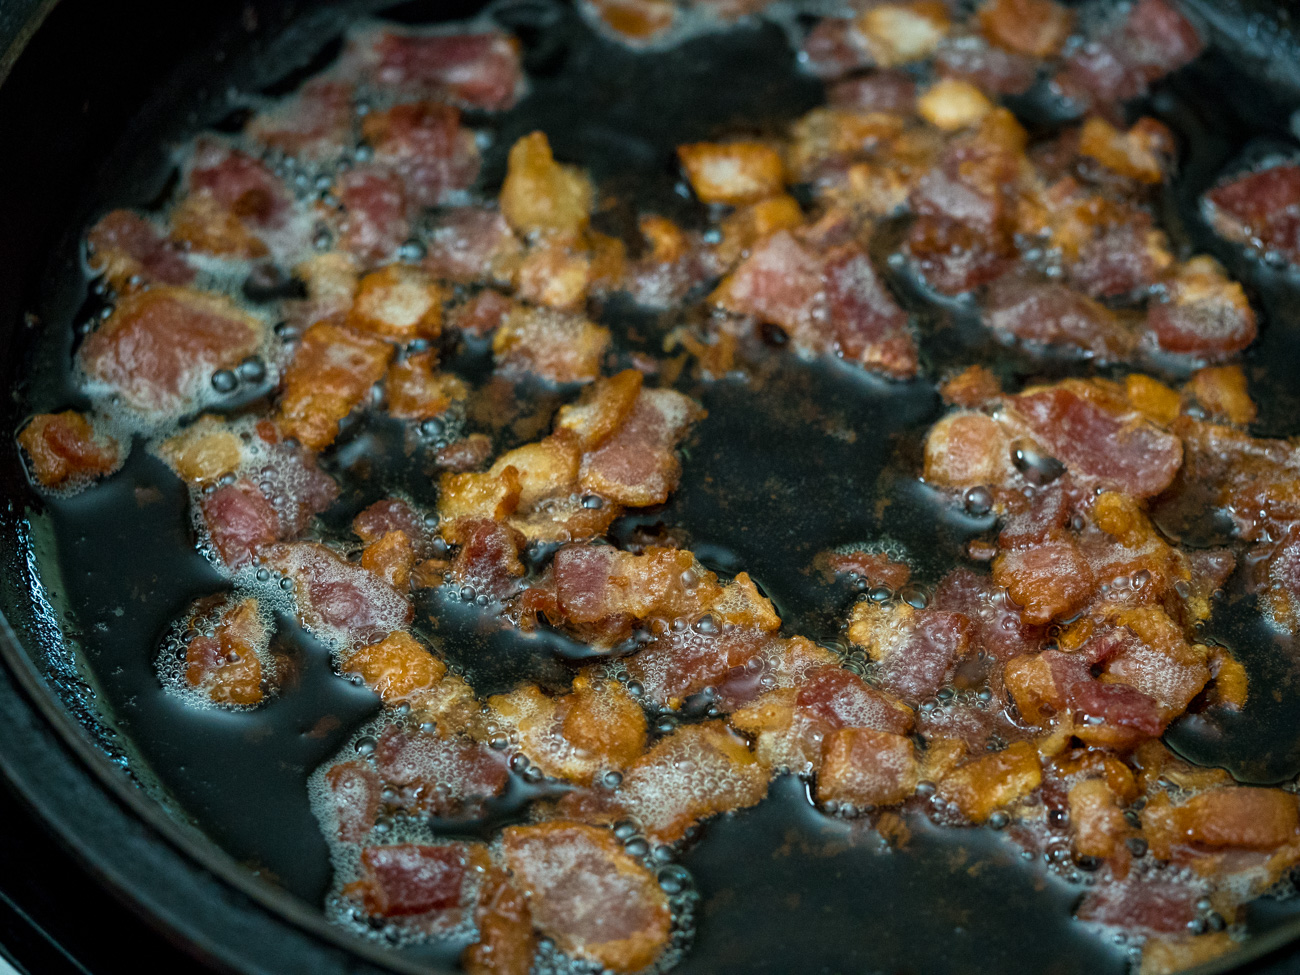 cooking bacon for Bavarian Potato Salad